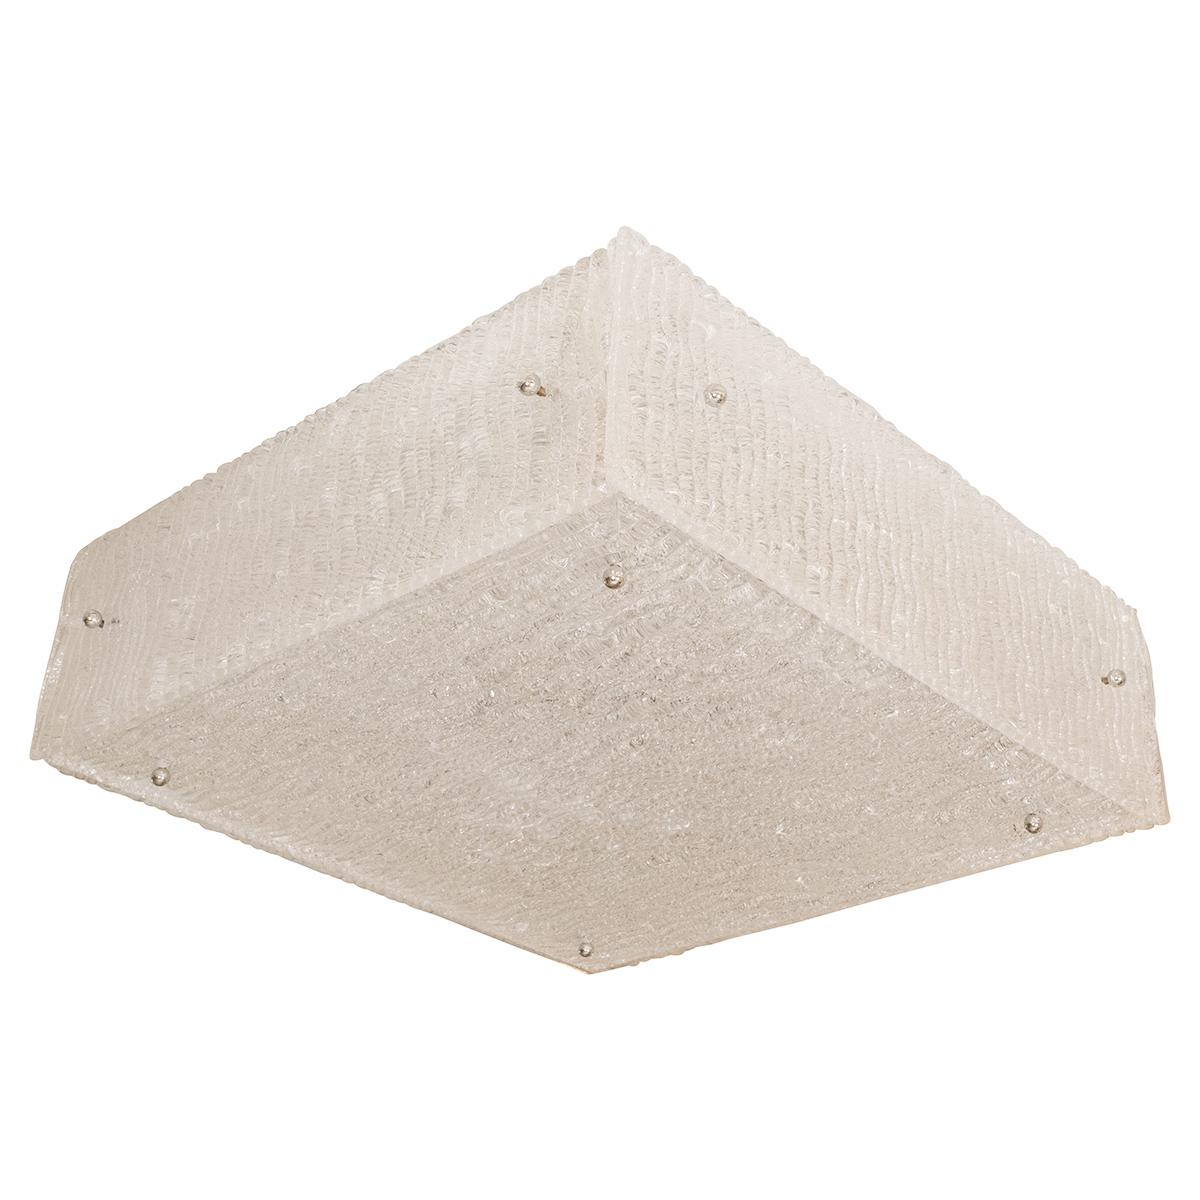 Square Textured Glass Flush Mount Ceiling Fixture